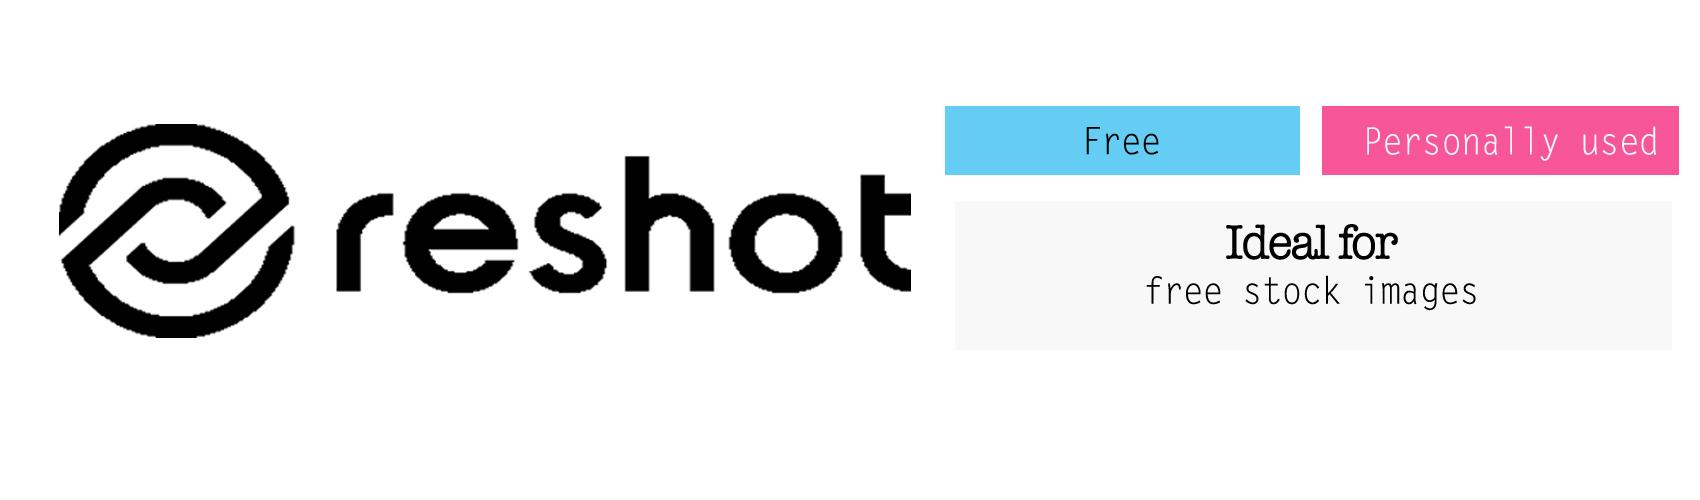 free stock images platform